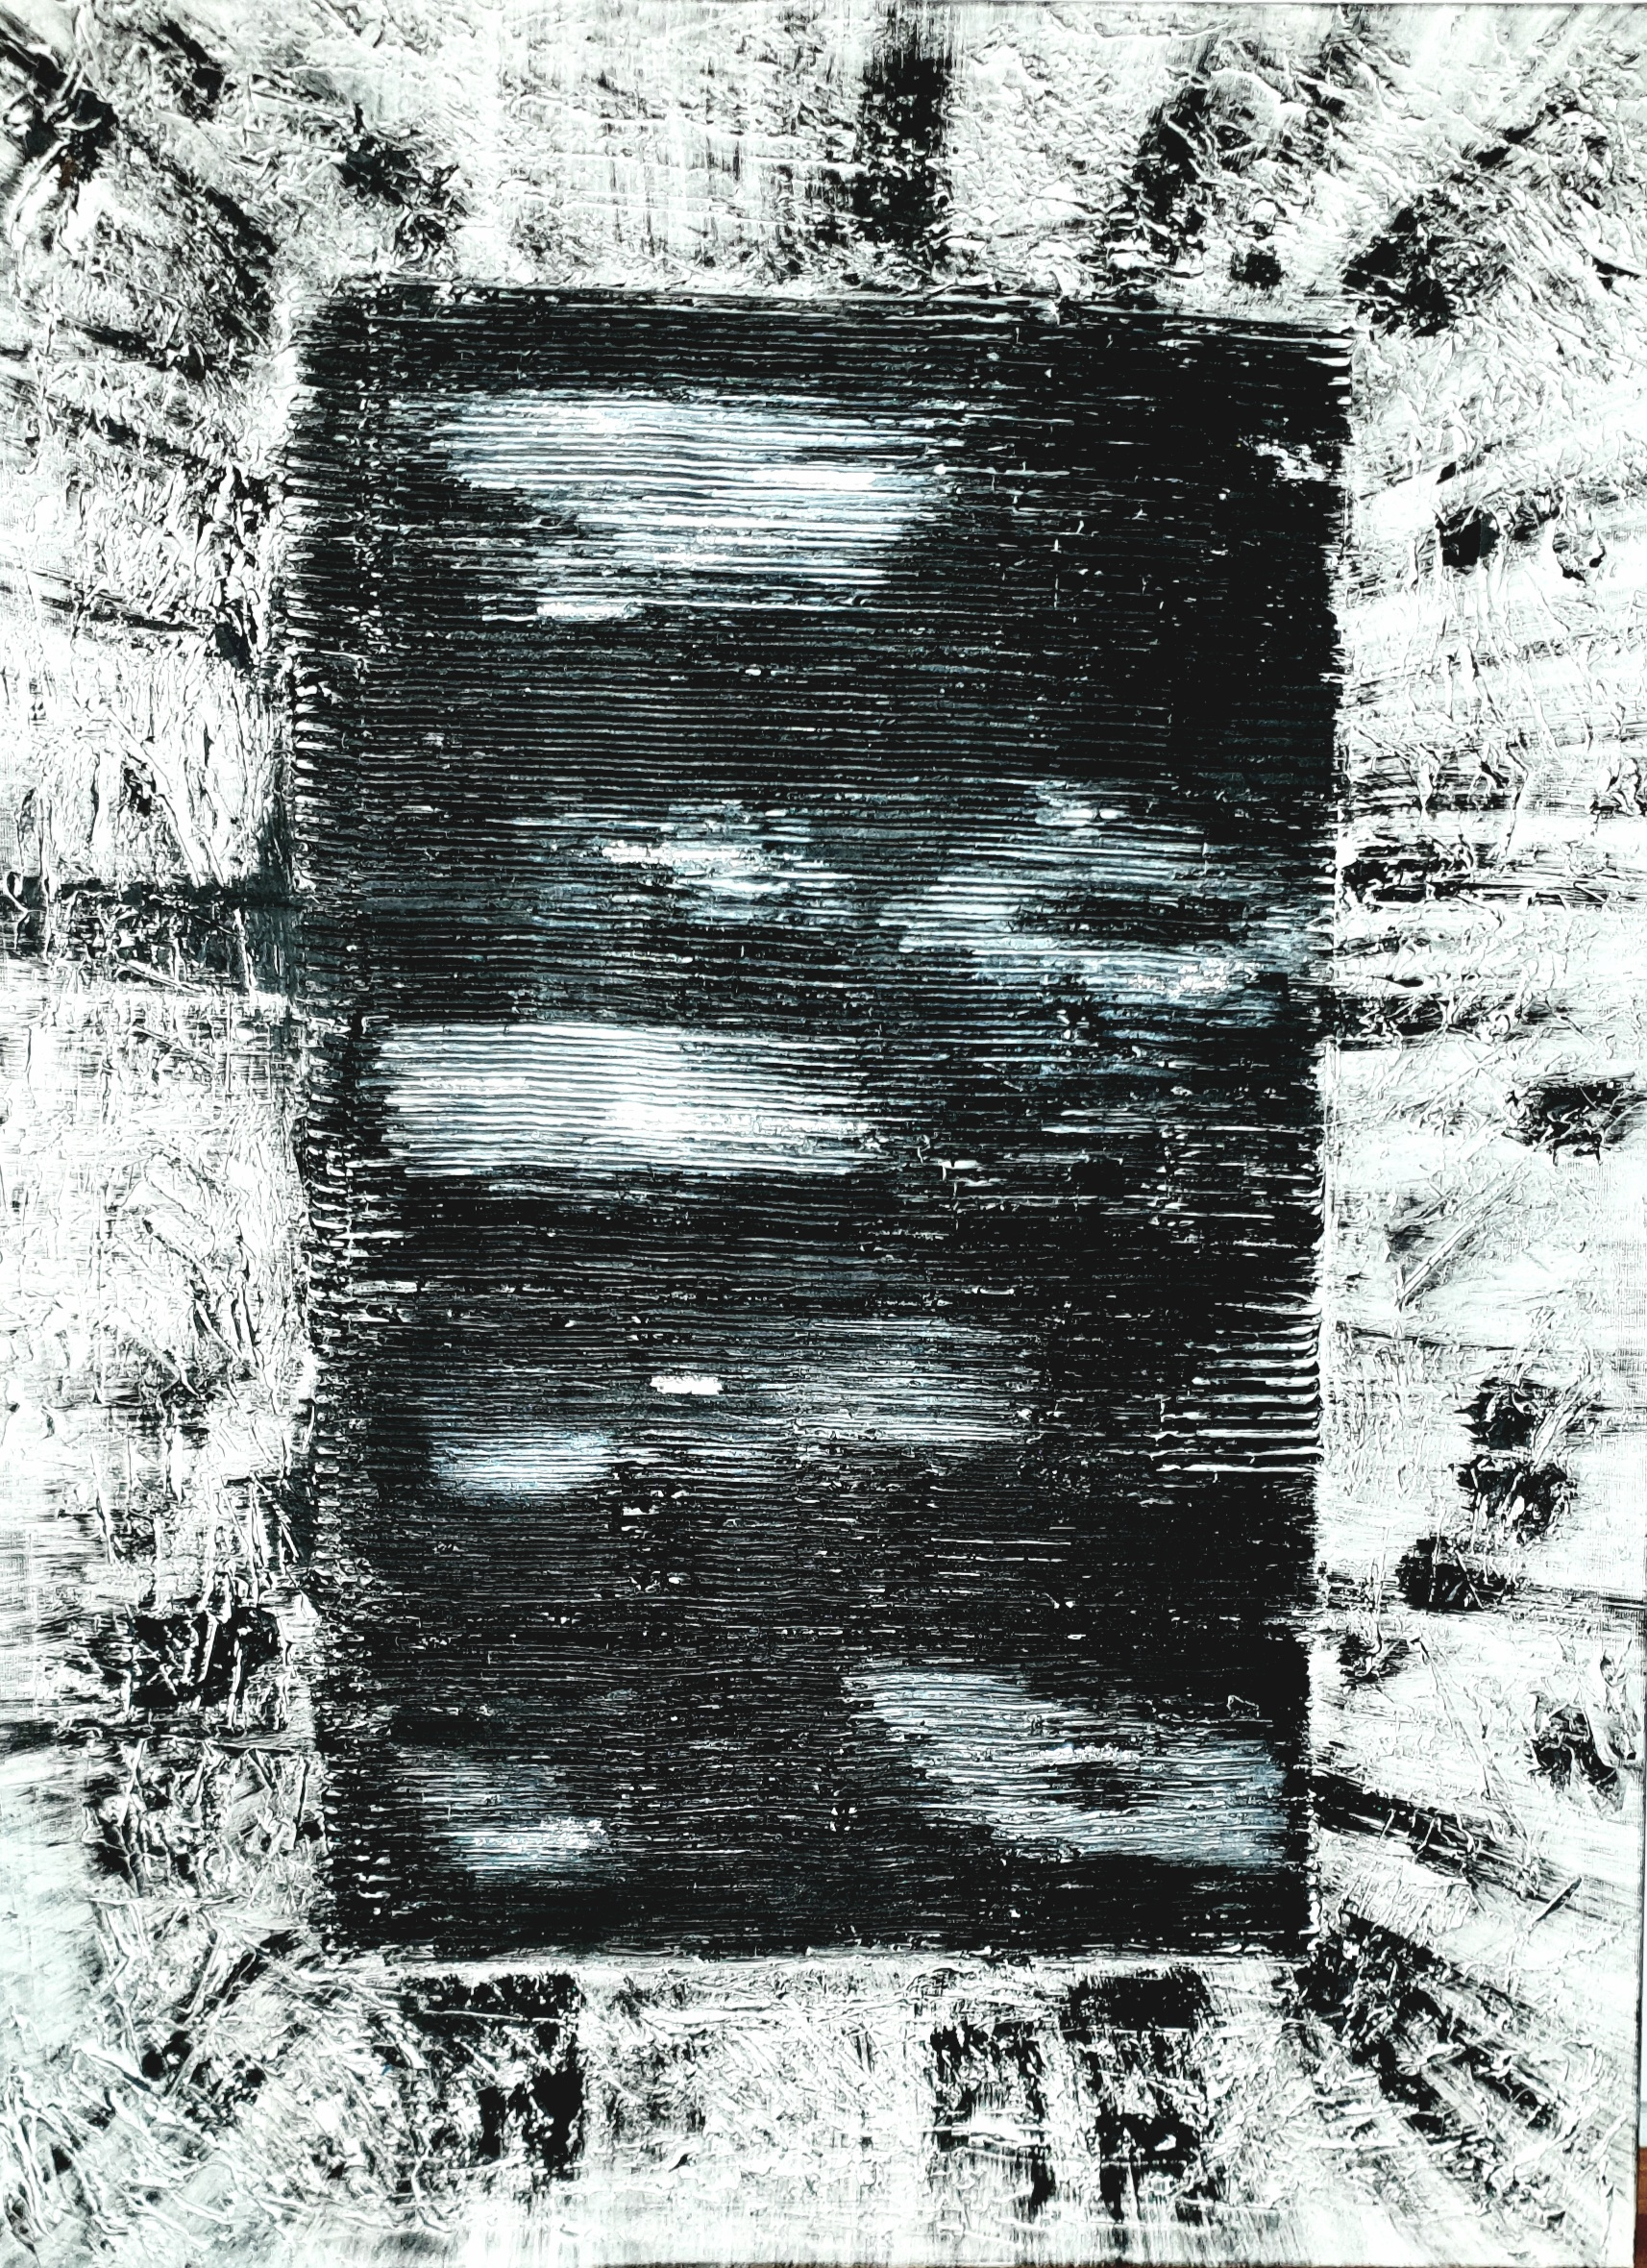 "Obraz akryl 70cm x 100cm x 4cm pt. ""Portal"" (2020)"